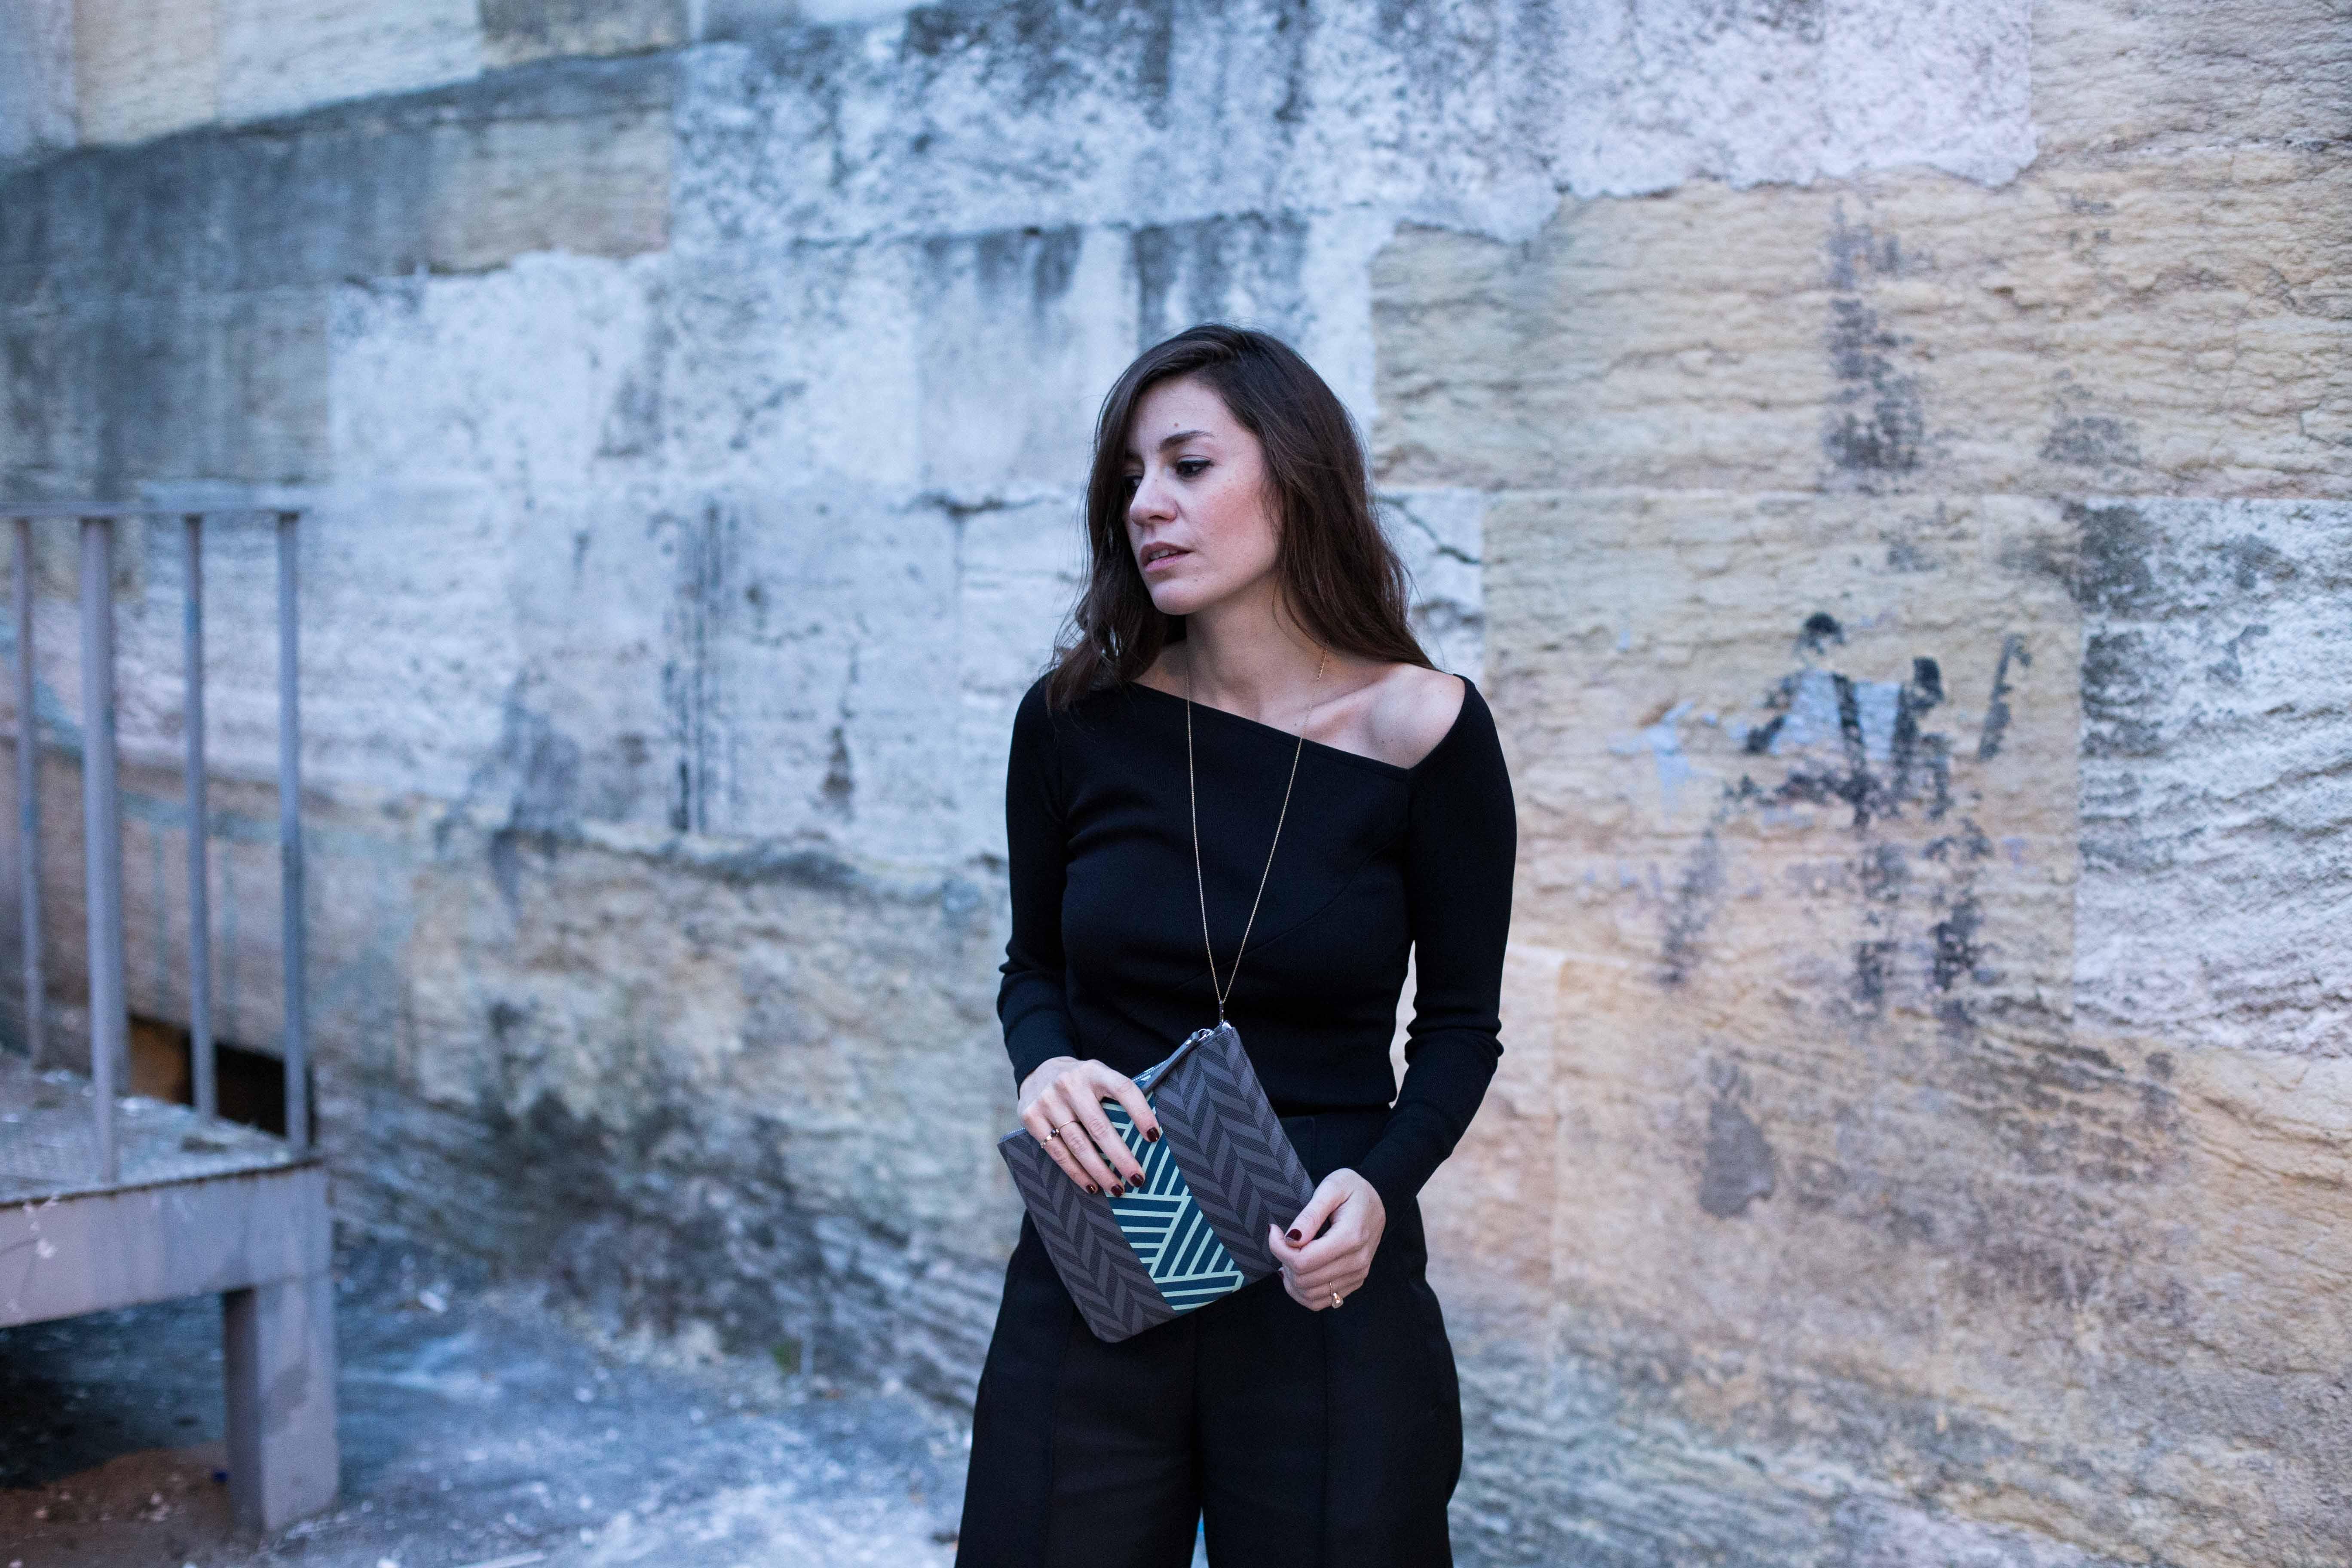 billur saatci, offnegiysem, turkish style blogger, street style, fashion, ootd, blogger, istanbul, misela, acne, ettyjacques, vsp, batya kebudi, barbara bui,